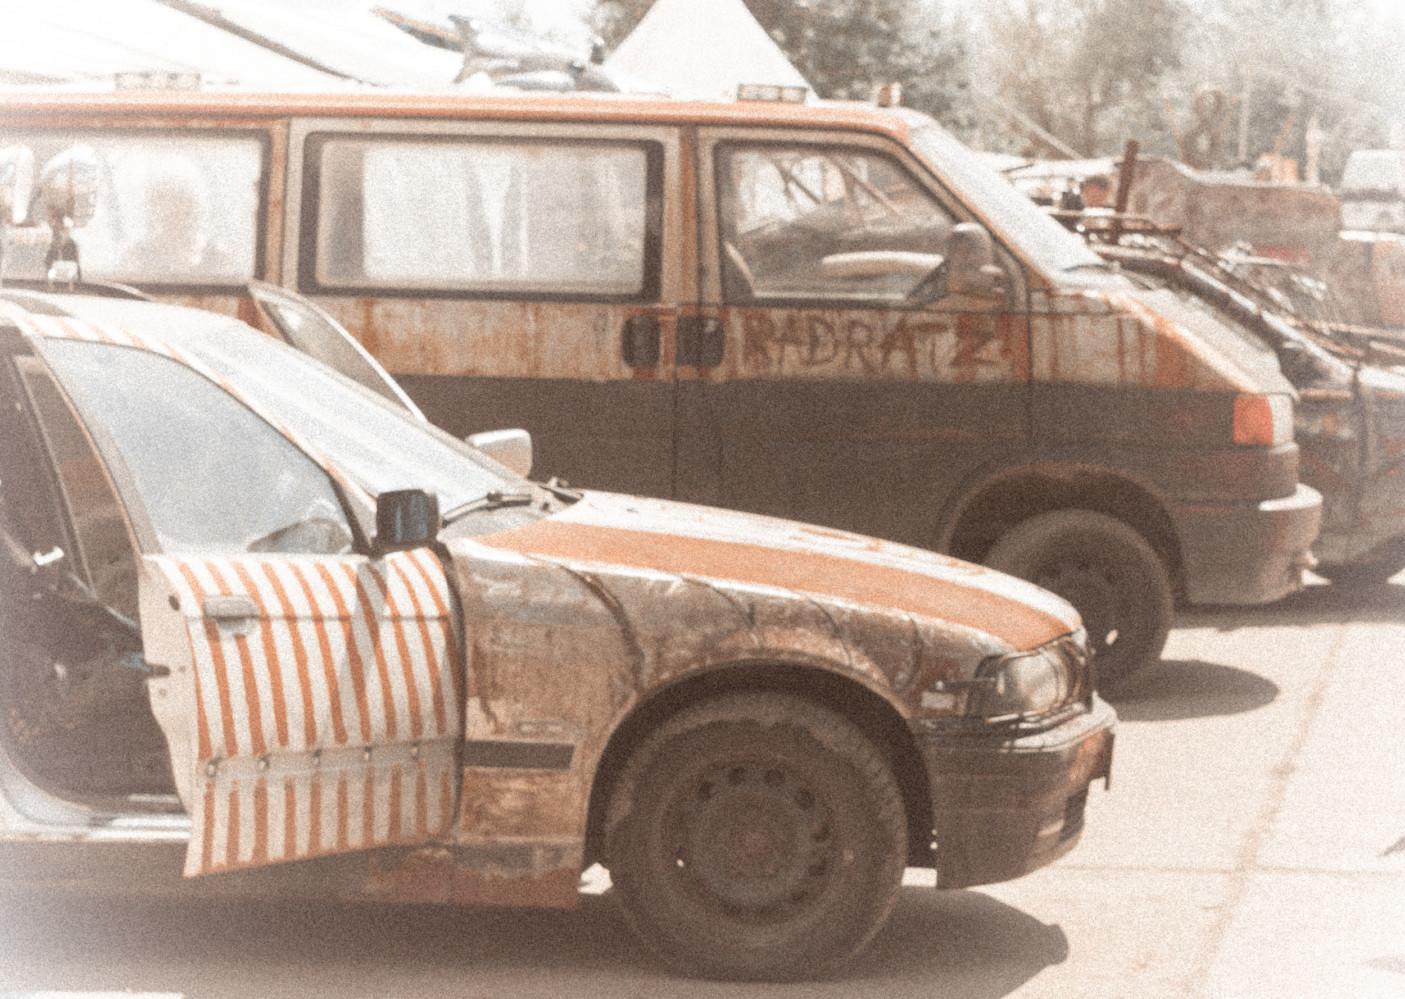 postapocalyptic cars